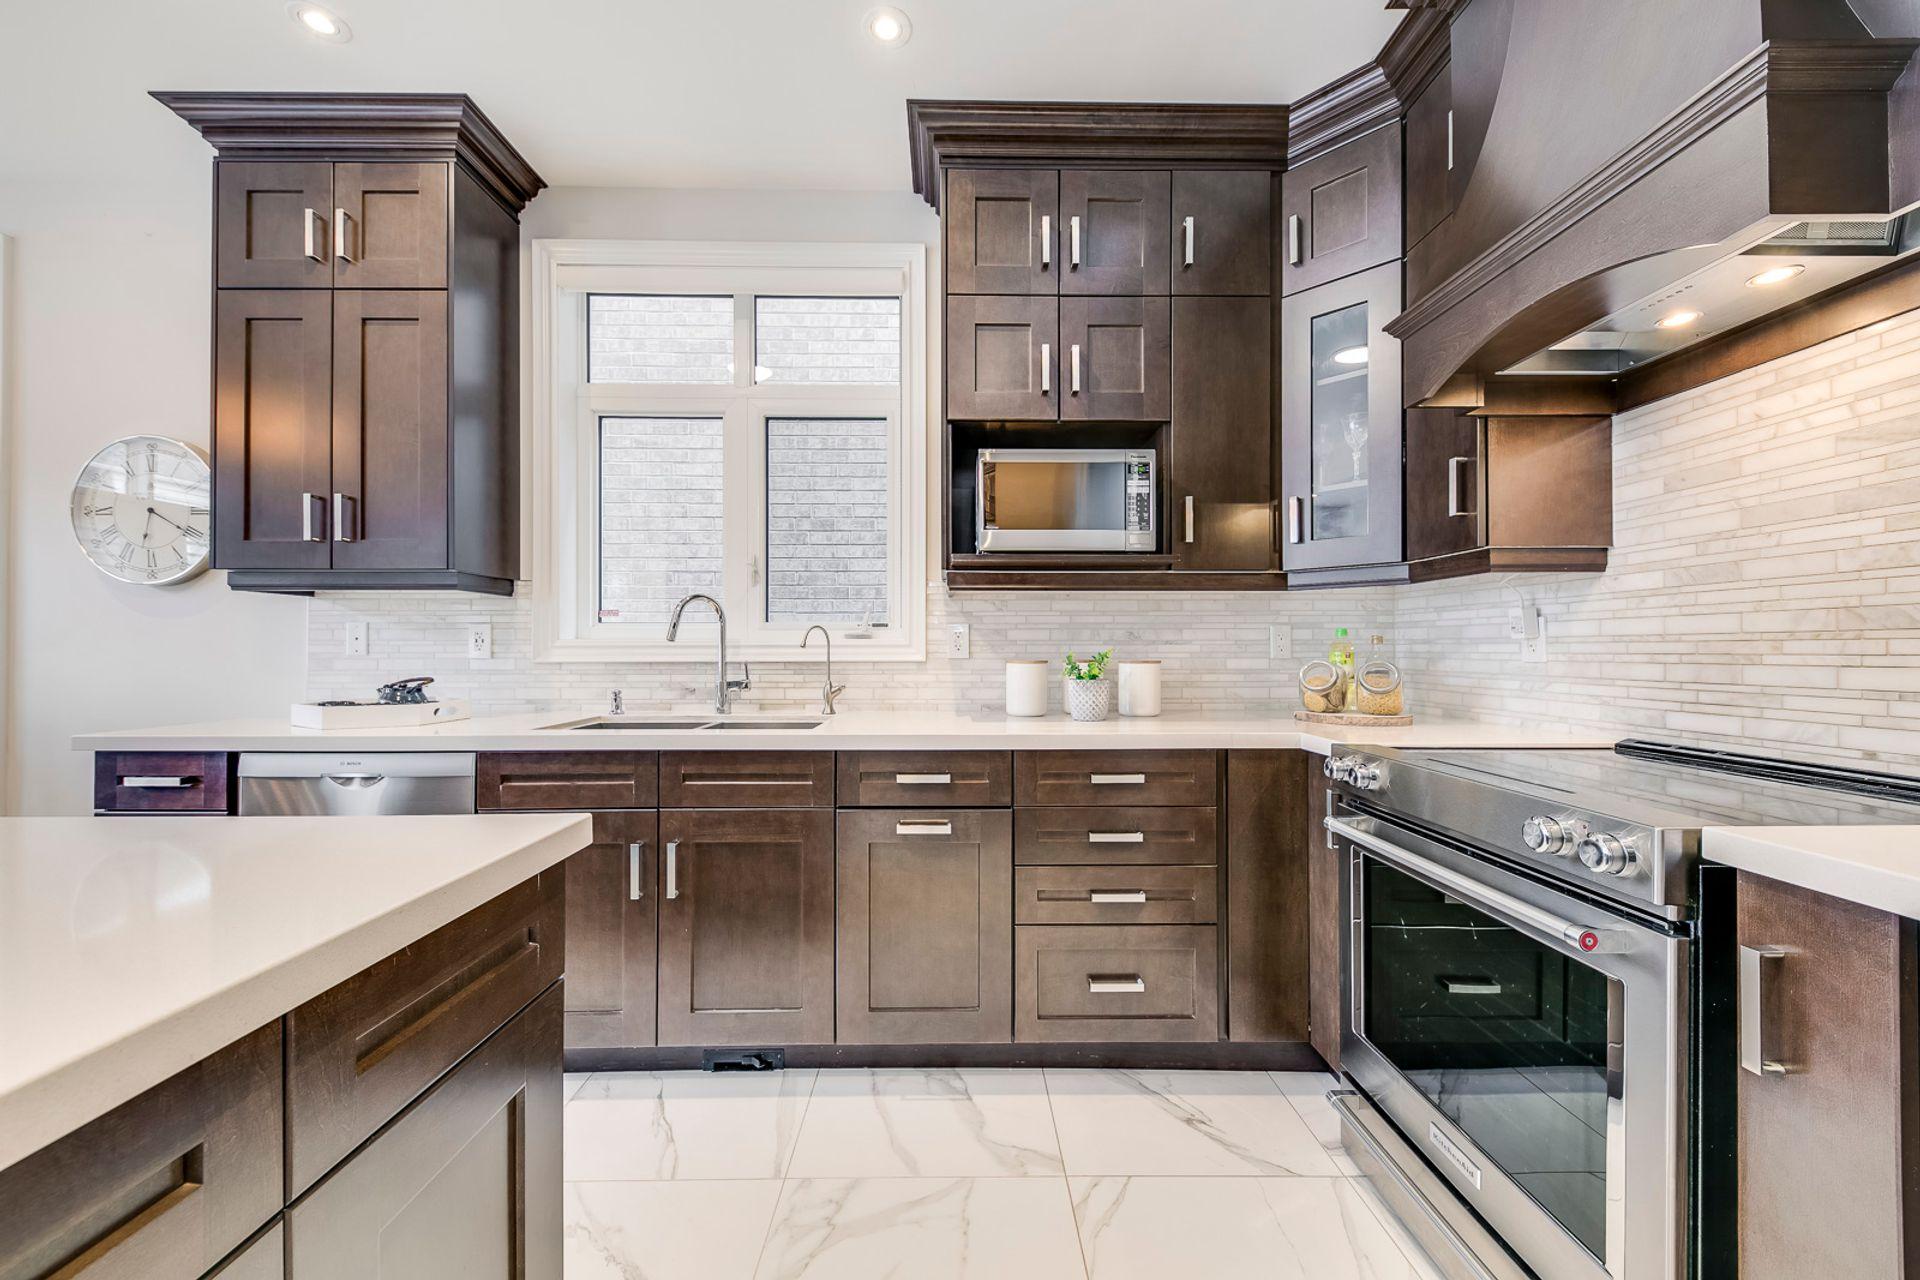 Kitchen - 3048 Parsonage Cres, Oakville - Elite3 & Team at 3048 Parsonage Crescent, Rural Oakville, Oakville